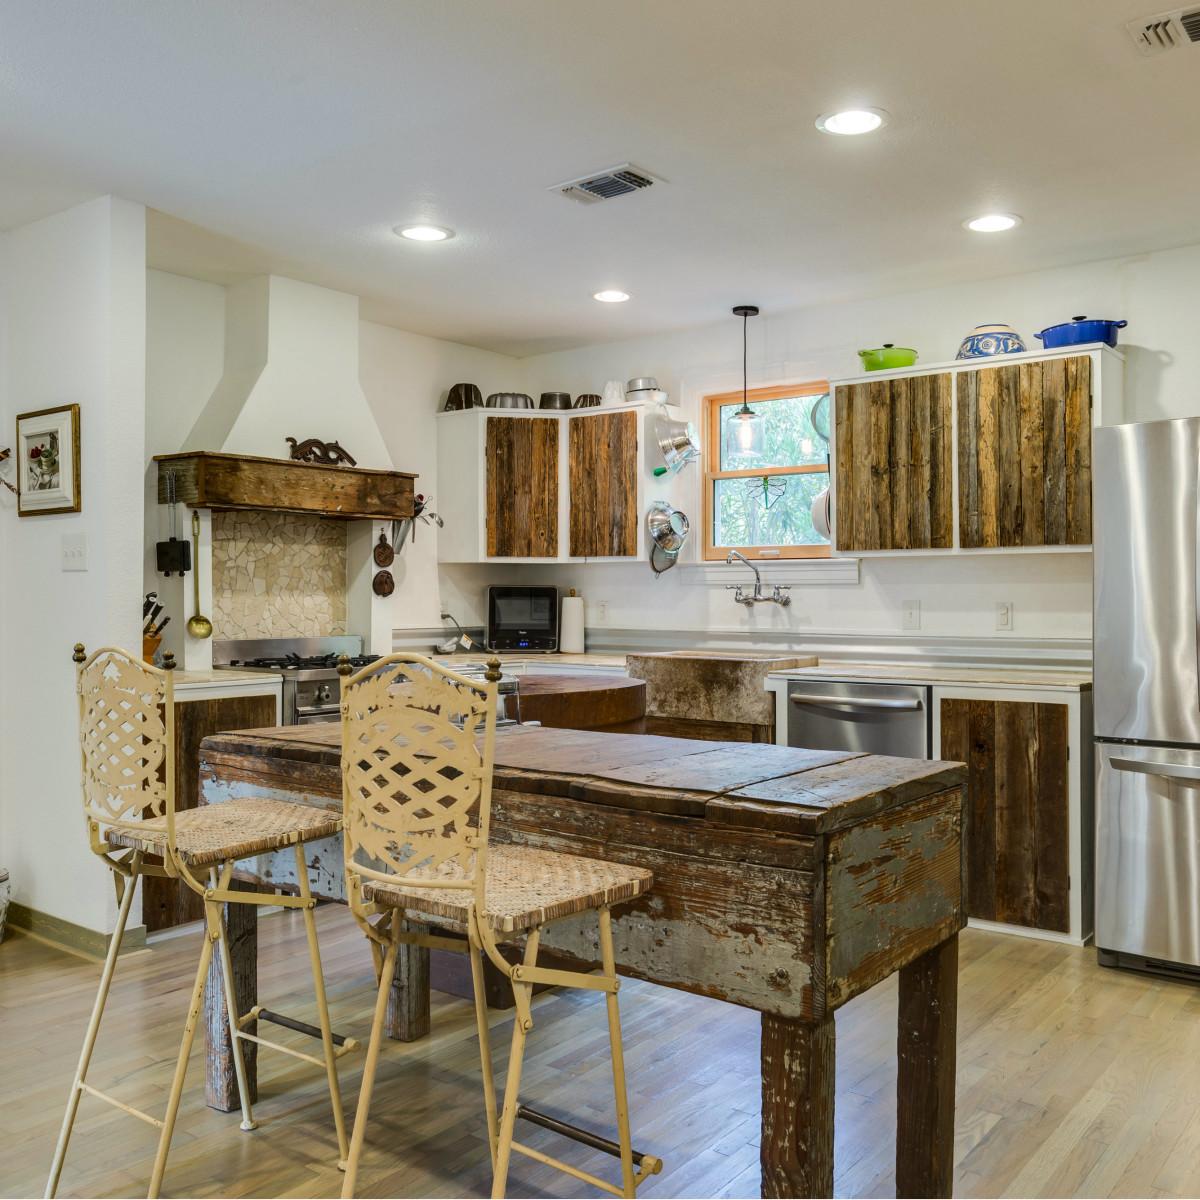 115 W Castano San Antonio house for sale kitchen